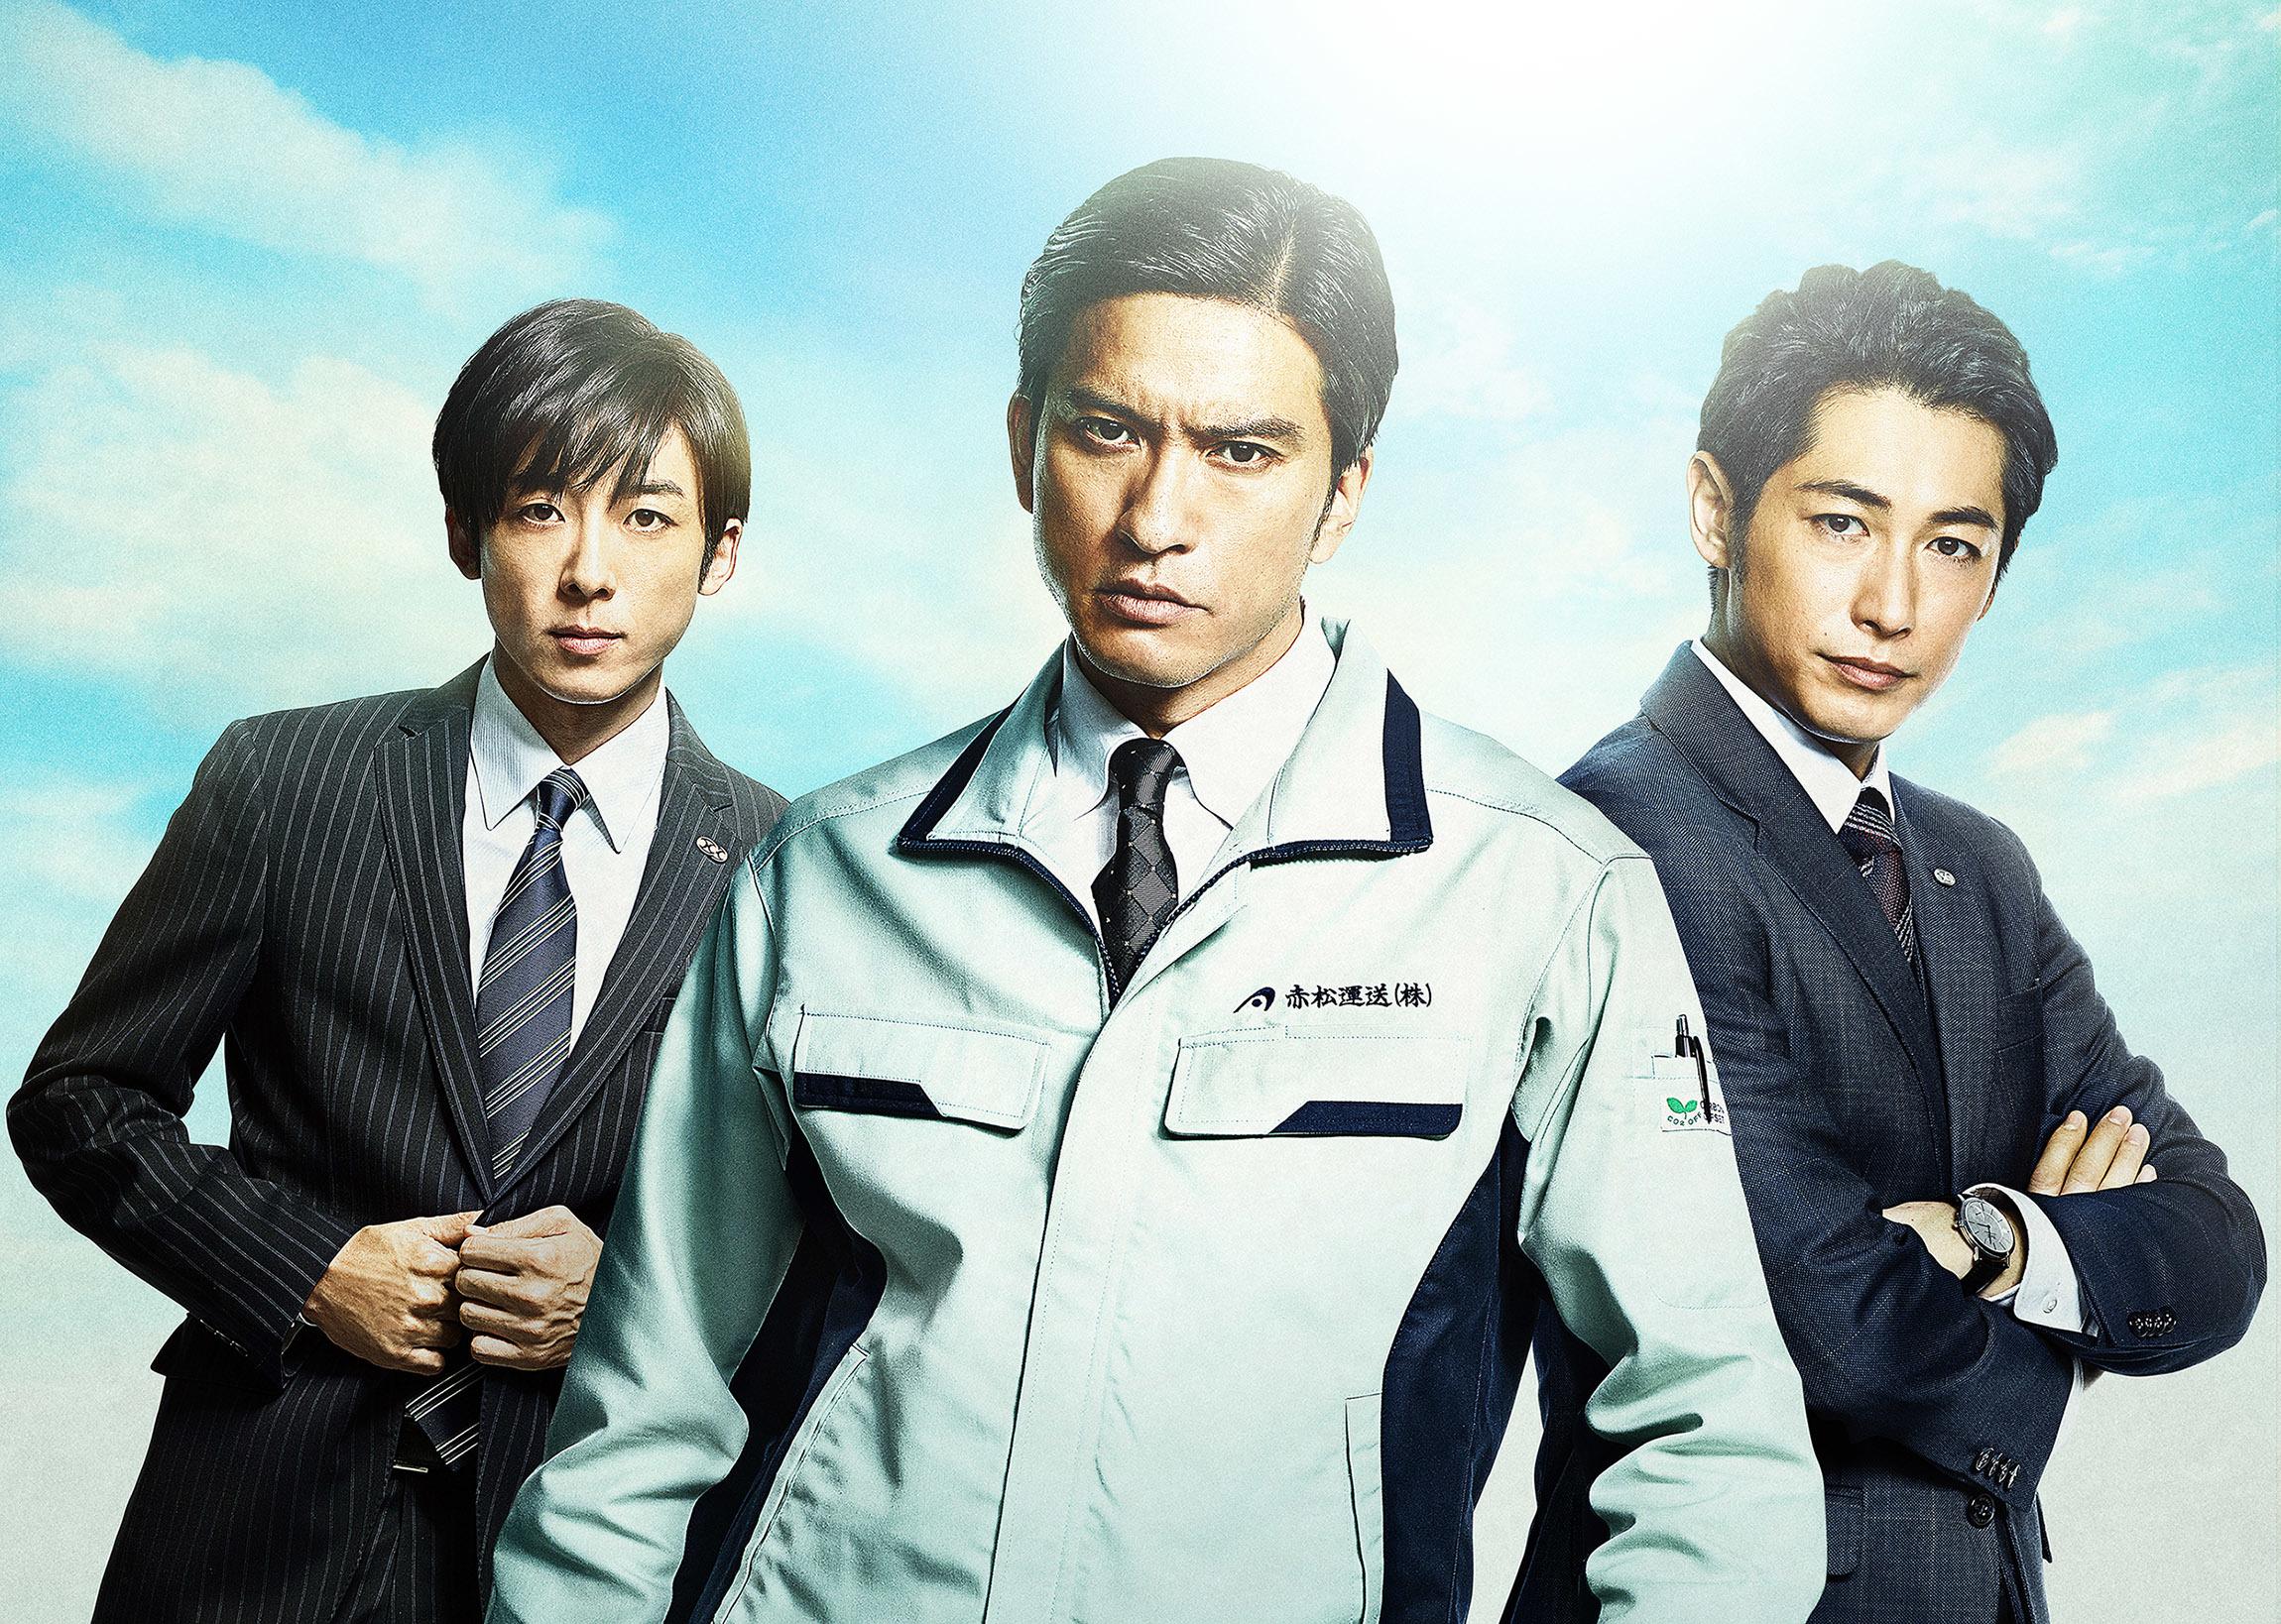 (C)2018映画「空飛ぶタイヤ」製作委員会